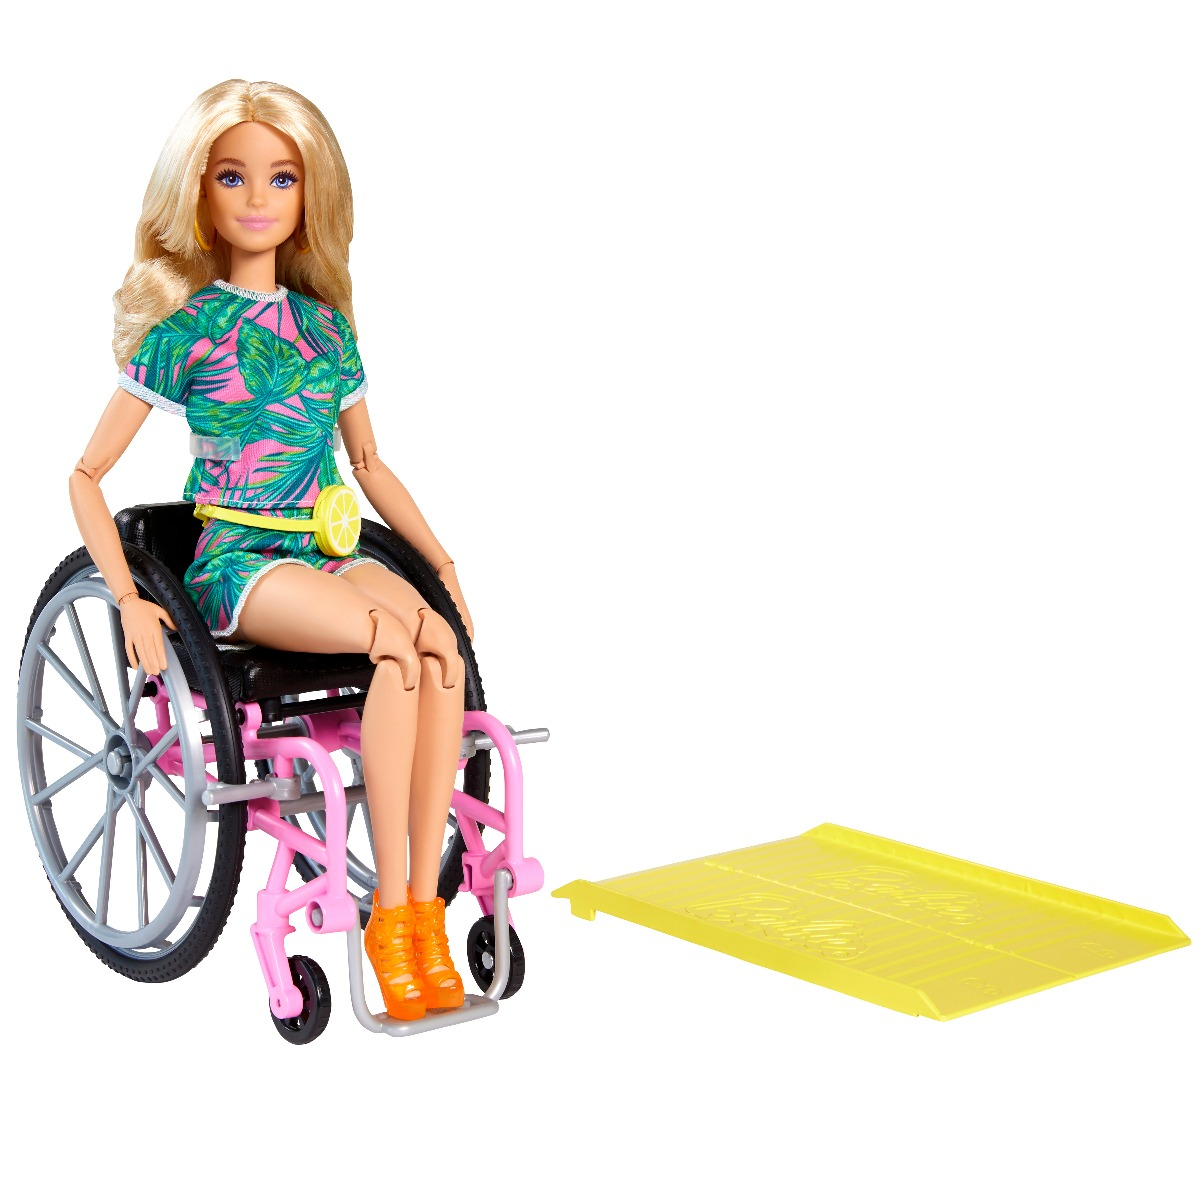 Papusa Barbie Fashionistas in scaun cu rotile, 165